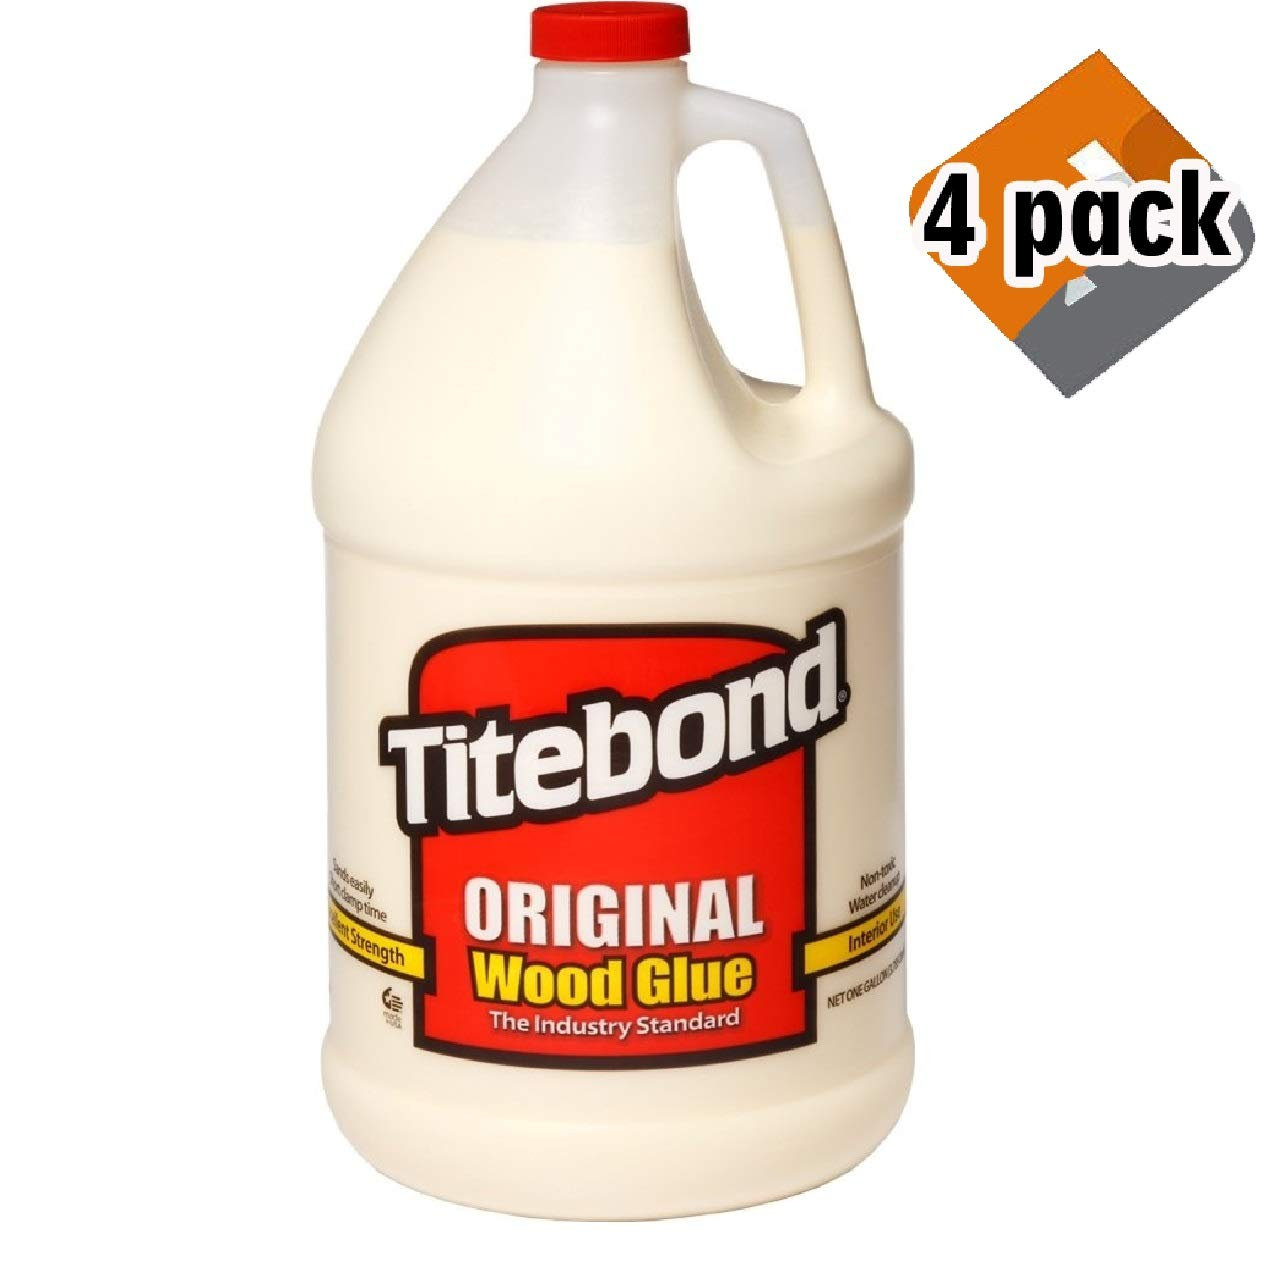 Titebond 5066F Original Wood Glue - Gallon, 4 Pack